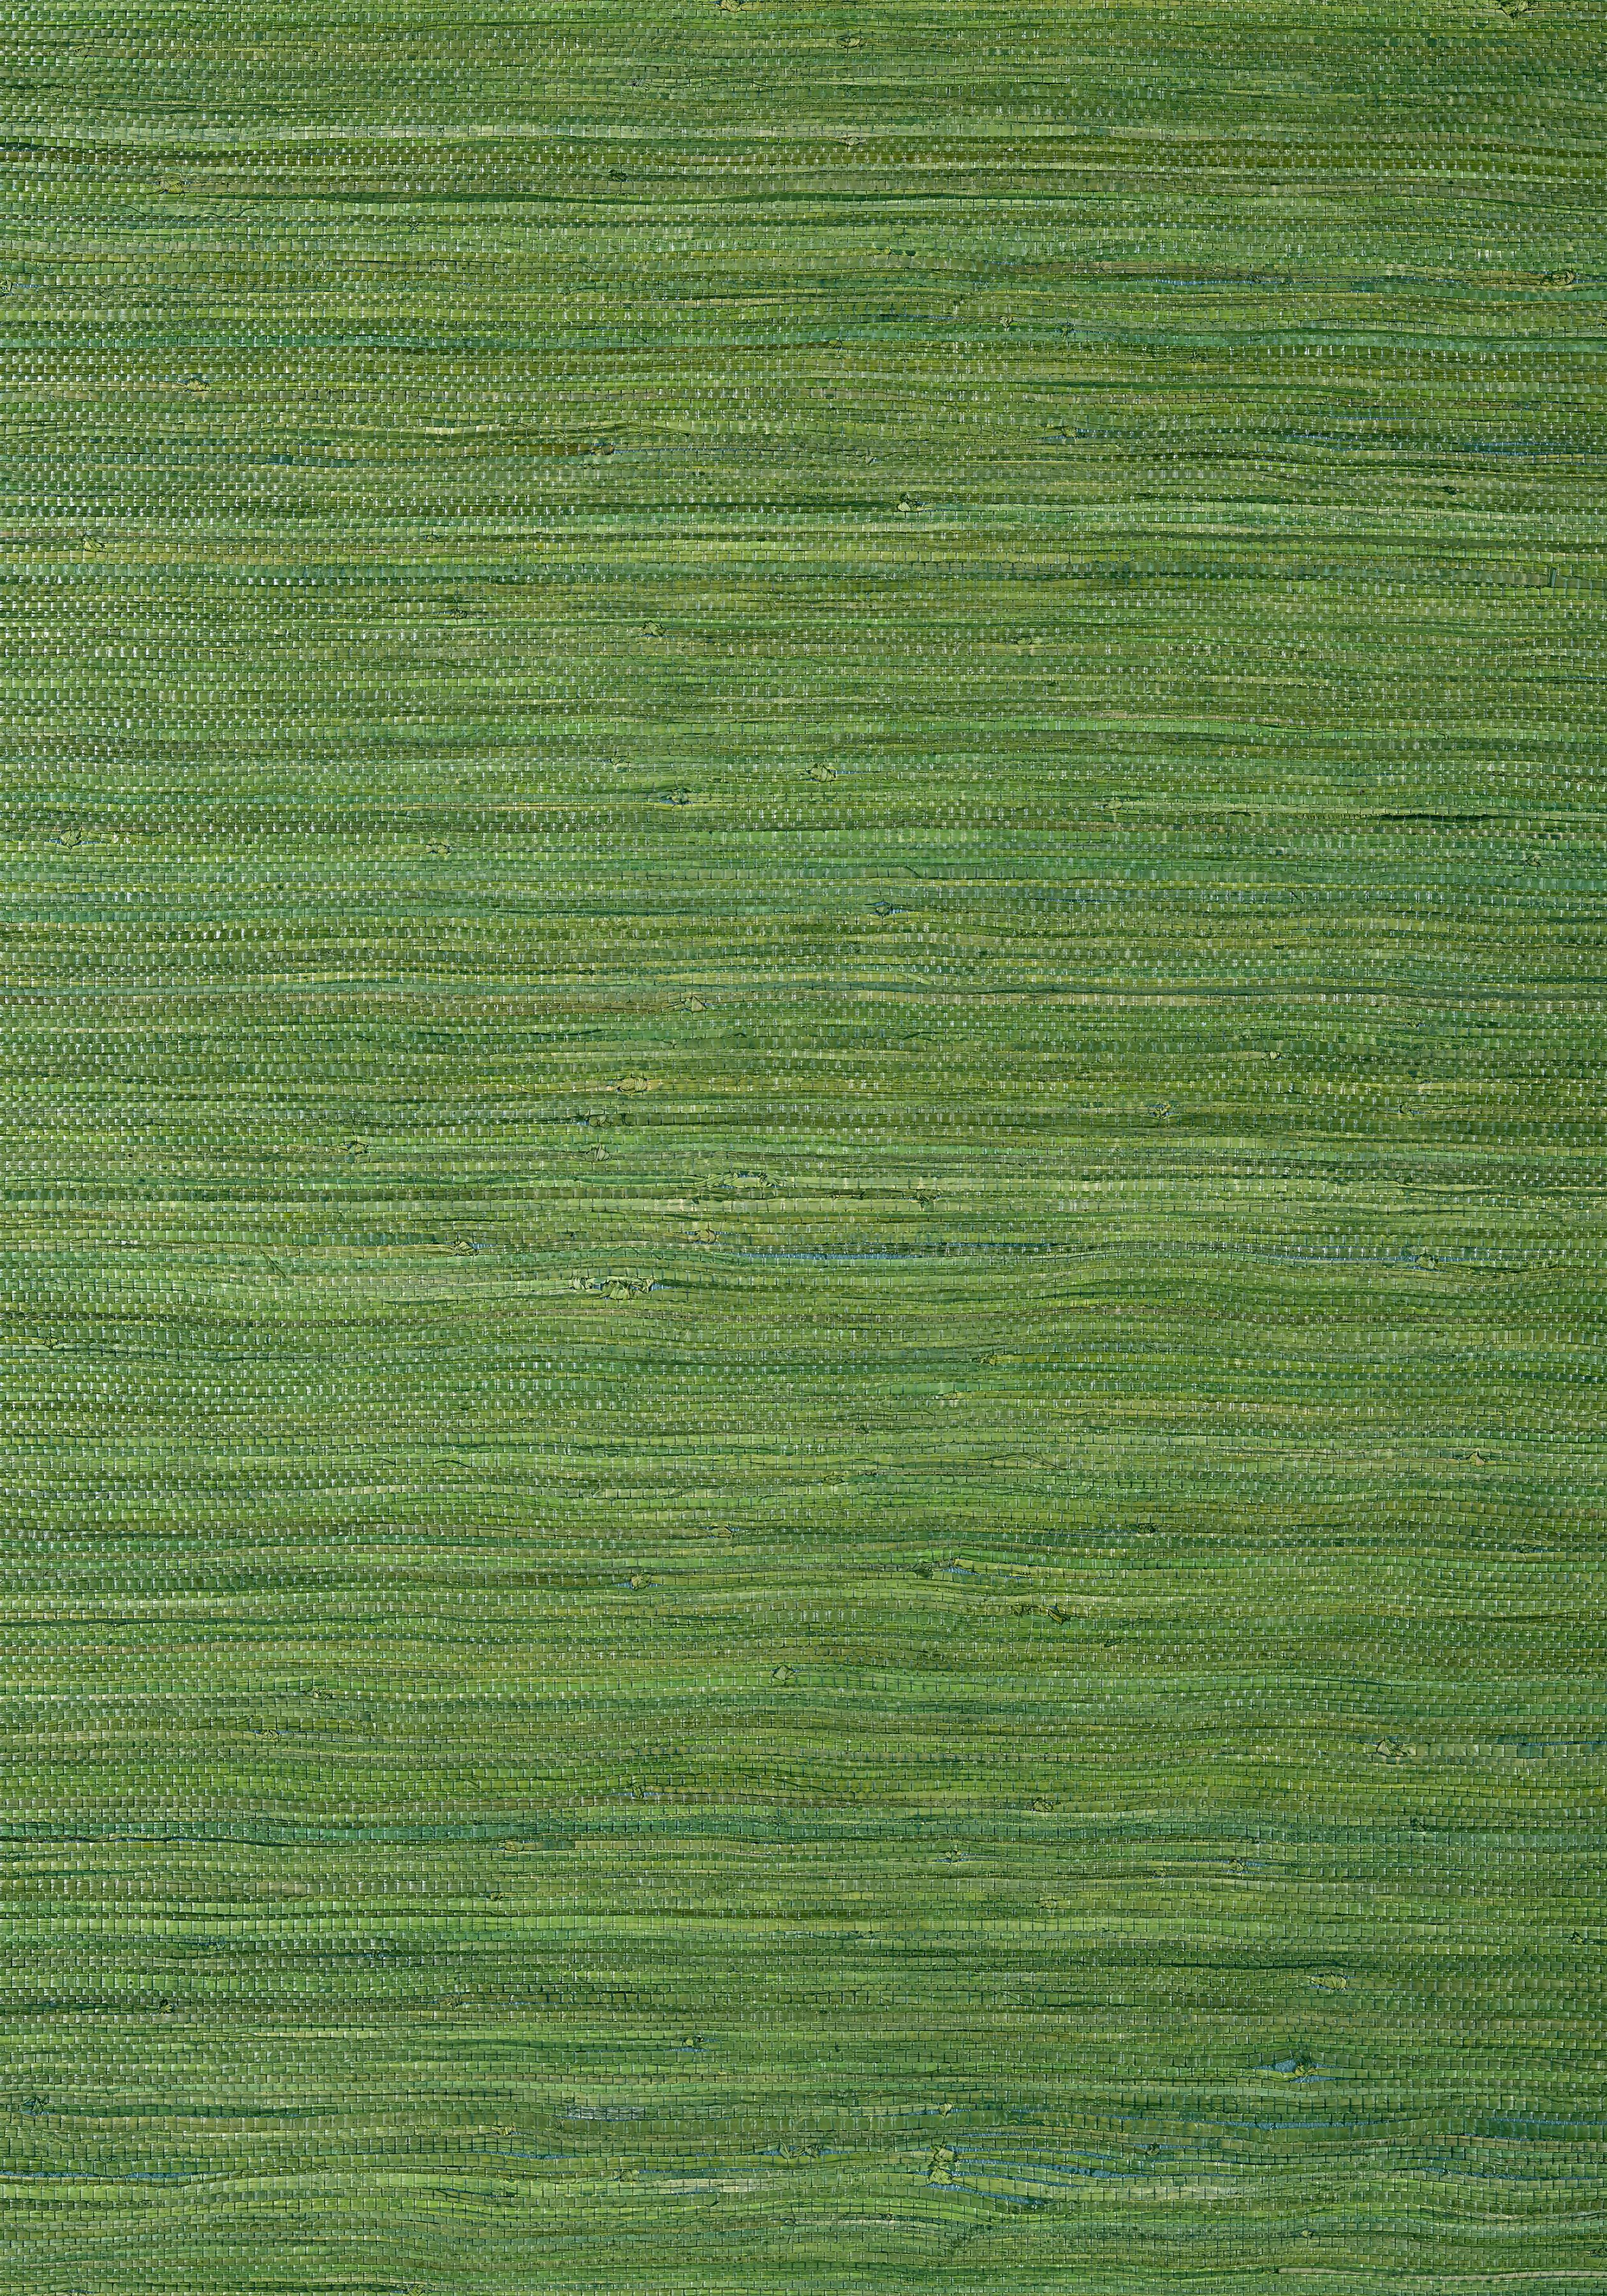 RAFFIA PALM, Emerald Green, T24074, Collection Grasscloth